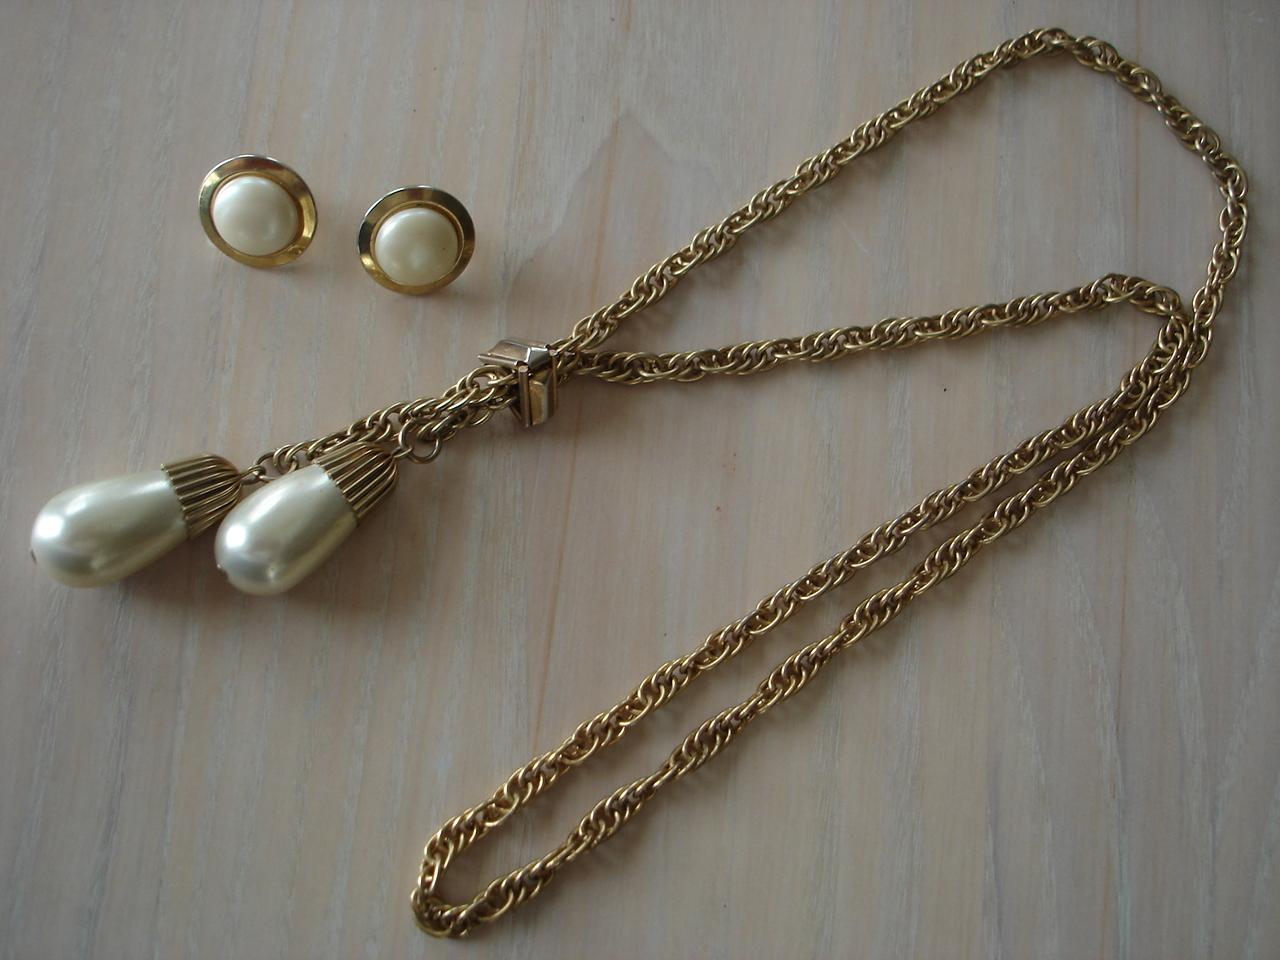 Vintage Gldtn Cap Lg Simulated Pearl Pendant Necklace, Earri Bonanza